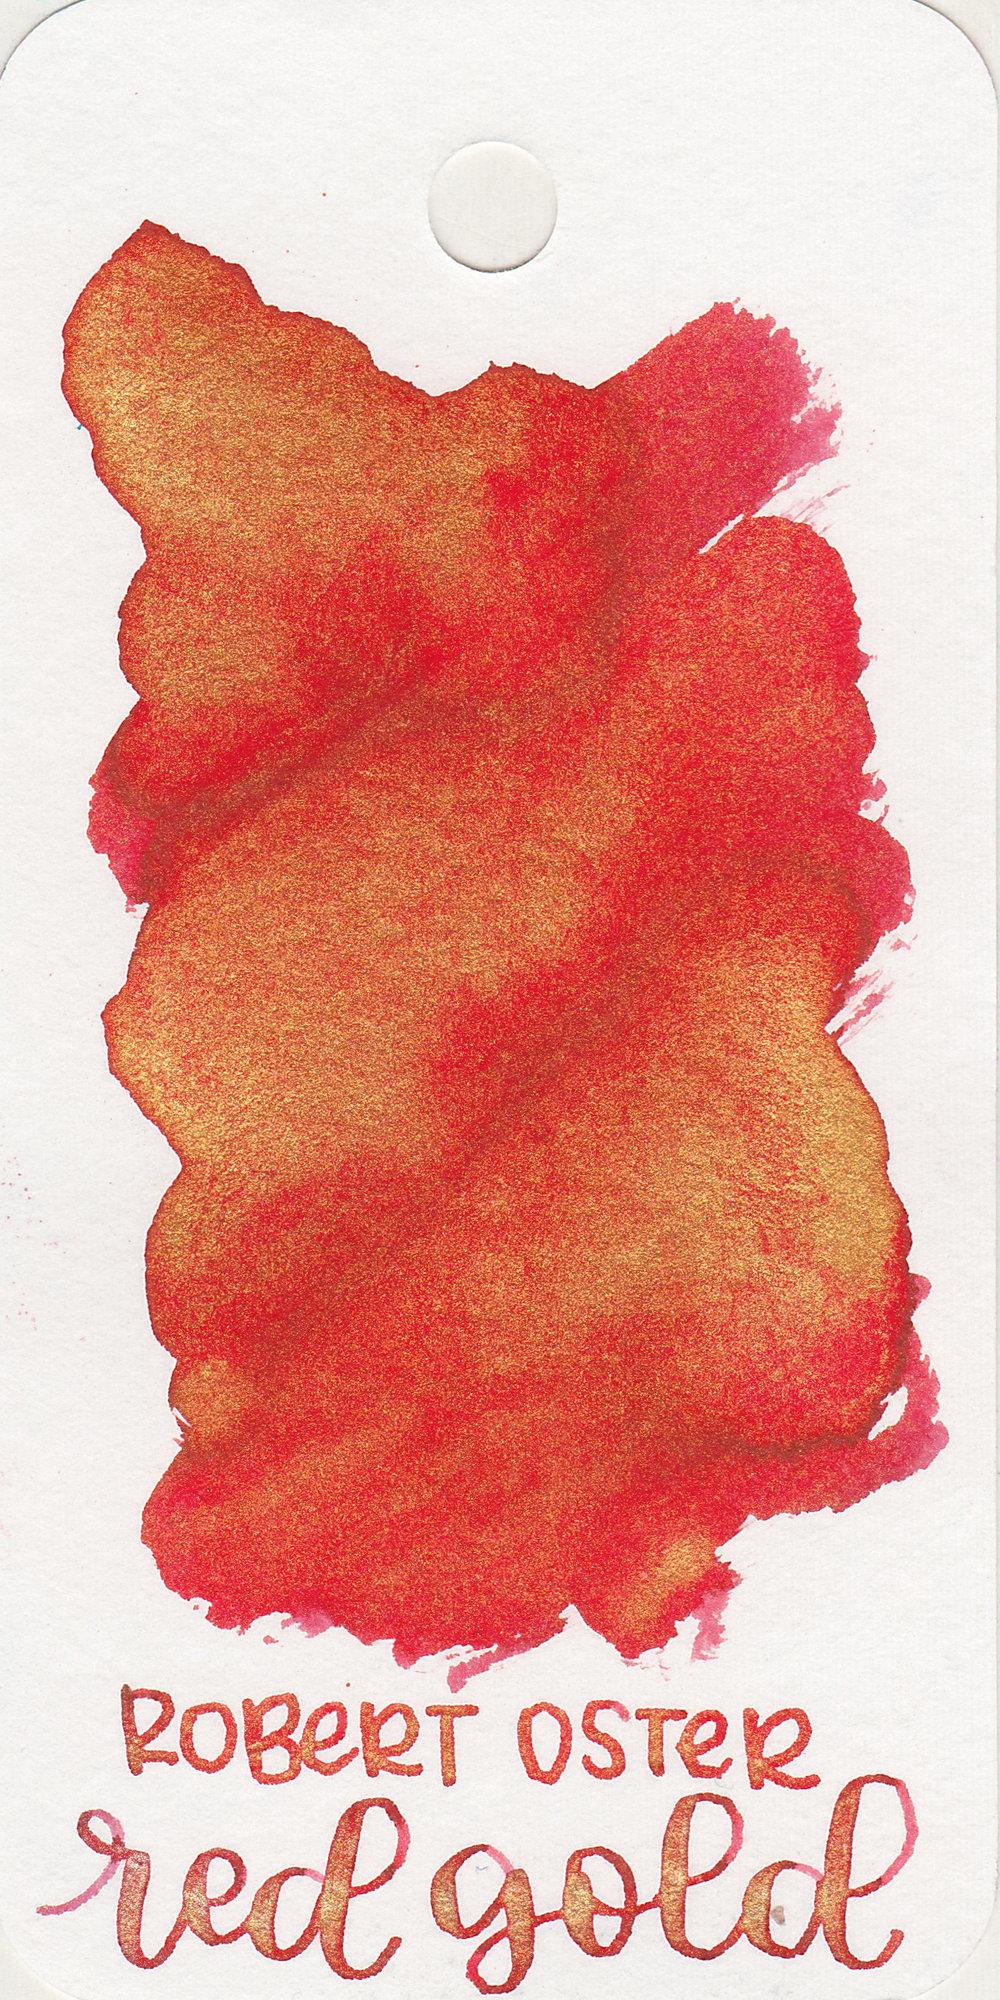 ro-red-gold-1.jpg